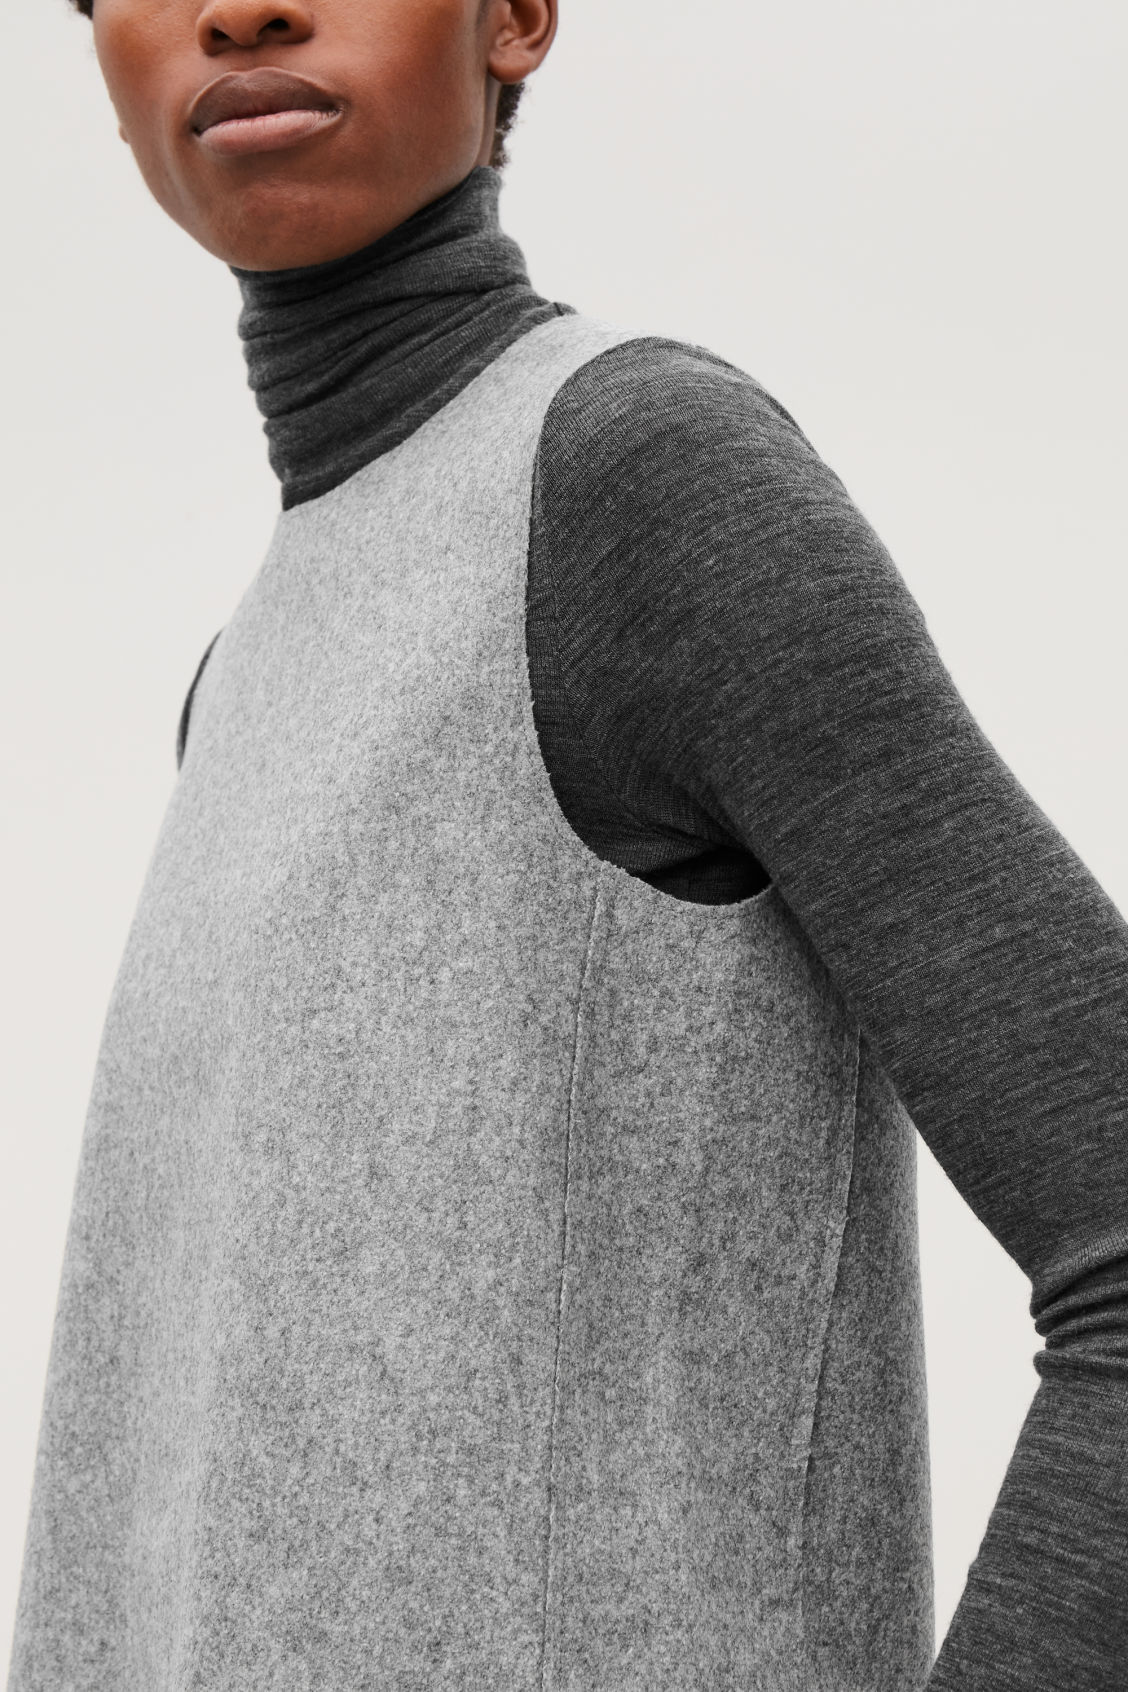 Coats Wool And Cos Vest Top Melange Grey Jackets Light Boxy 5jL3R4A